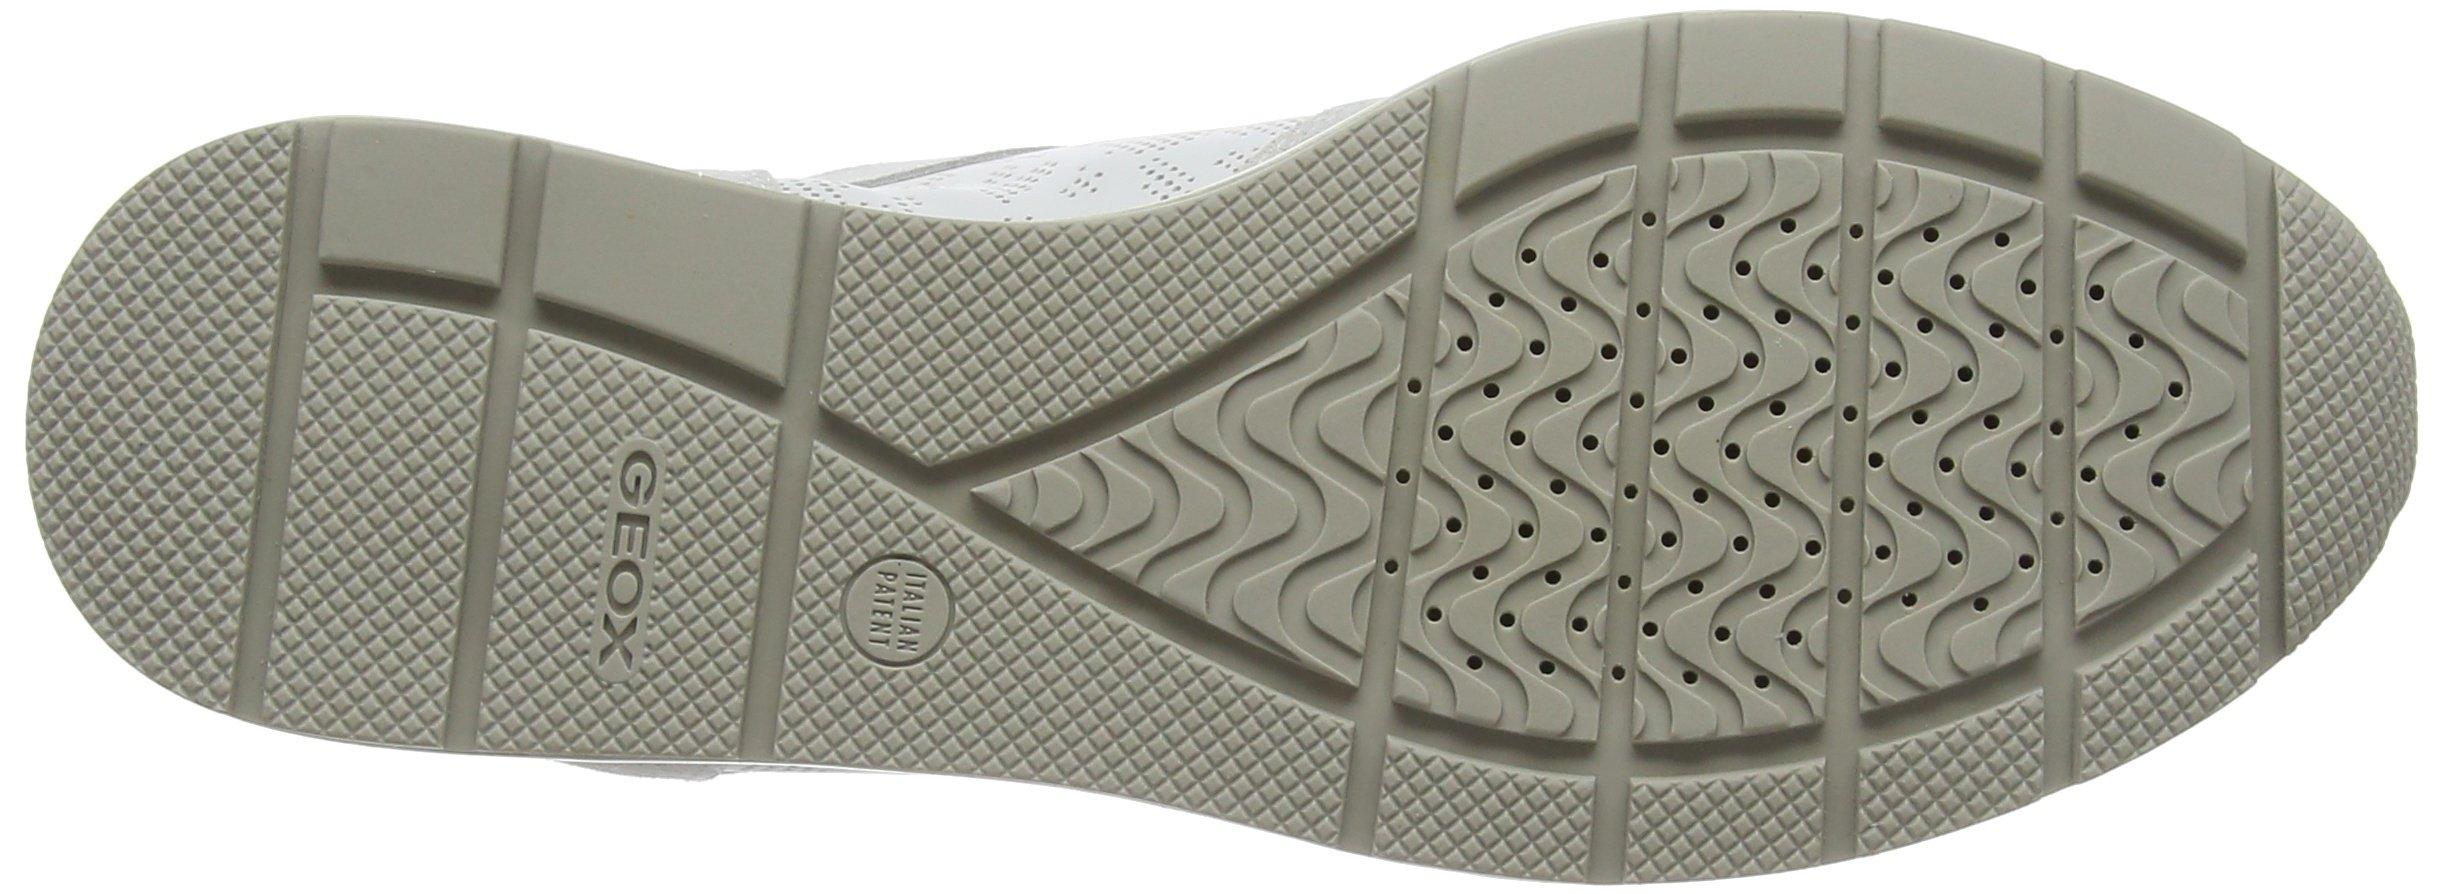 Geox Damen D Zosma C Sneaker 3